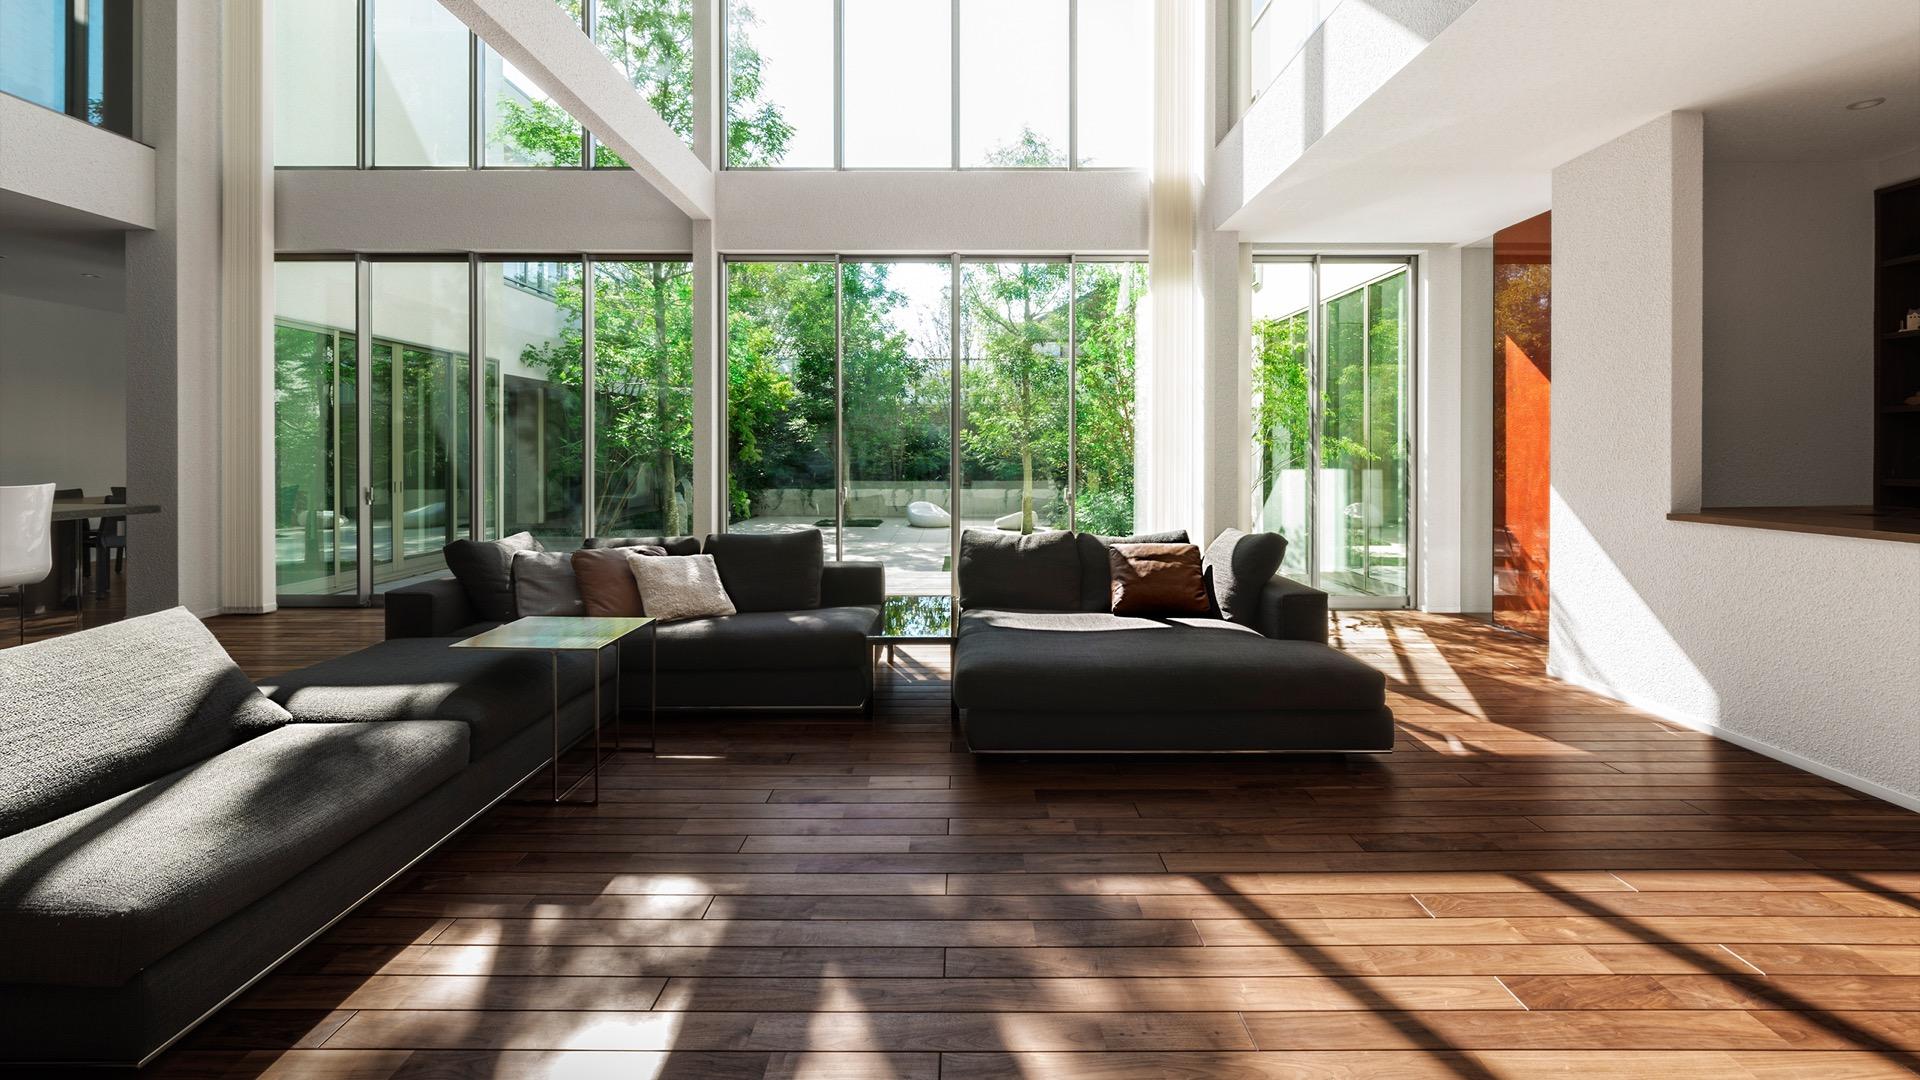 Works 013 端正で美しい邸宅 建築デザイン室 木造注文住宅の住友林業